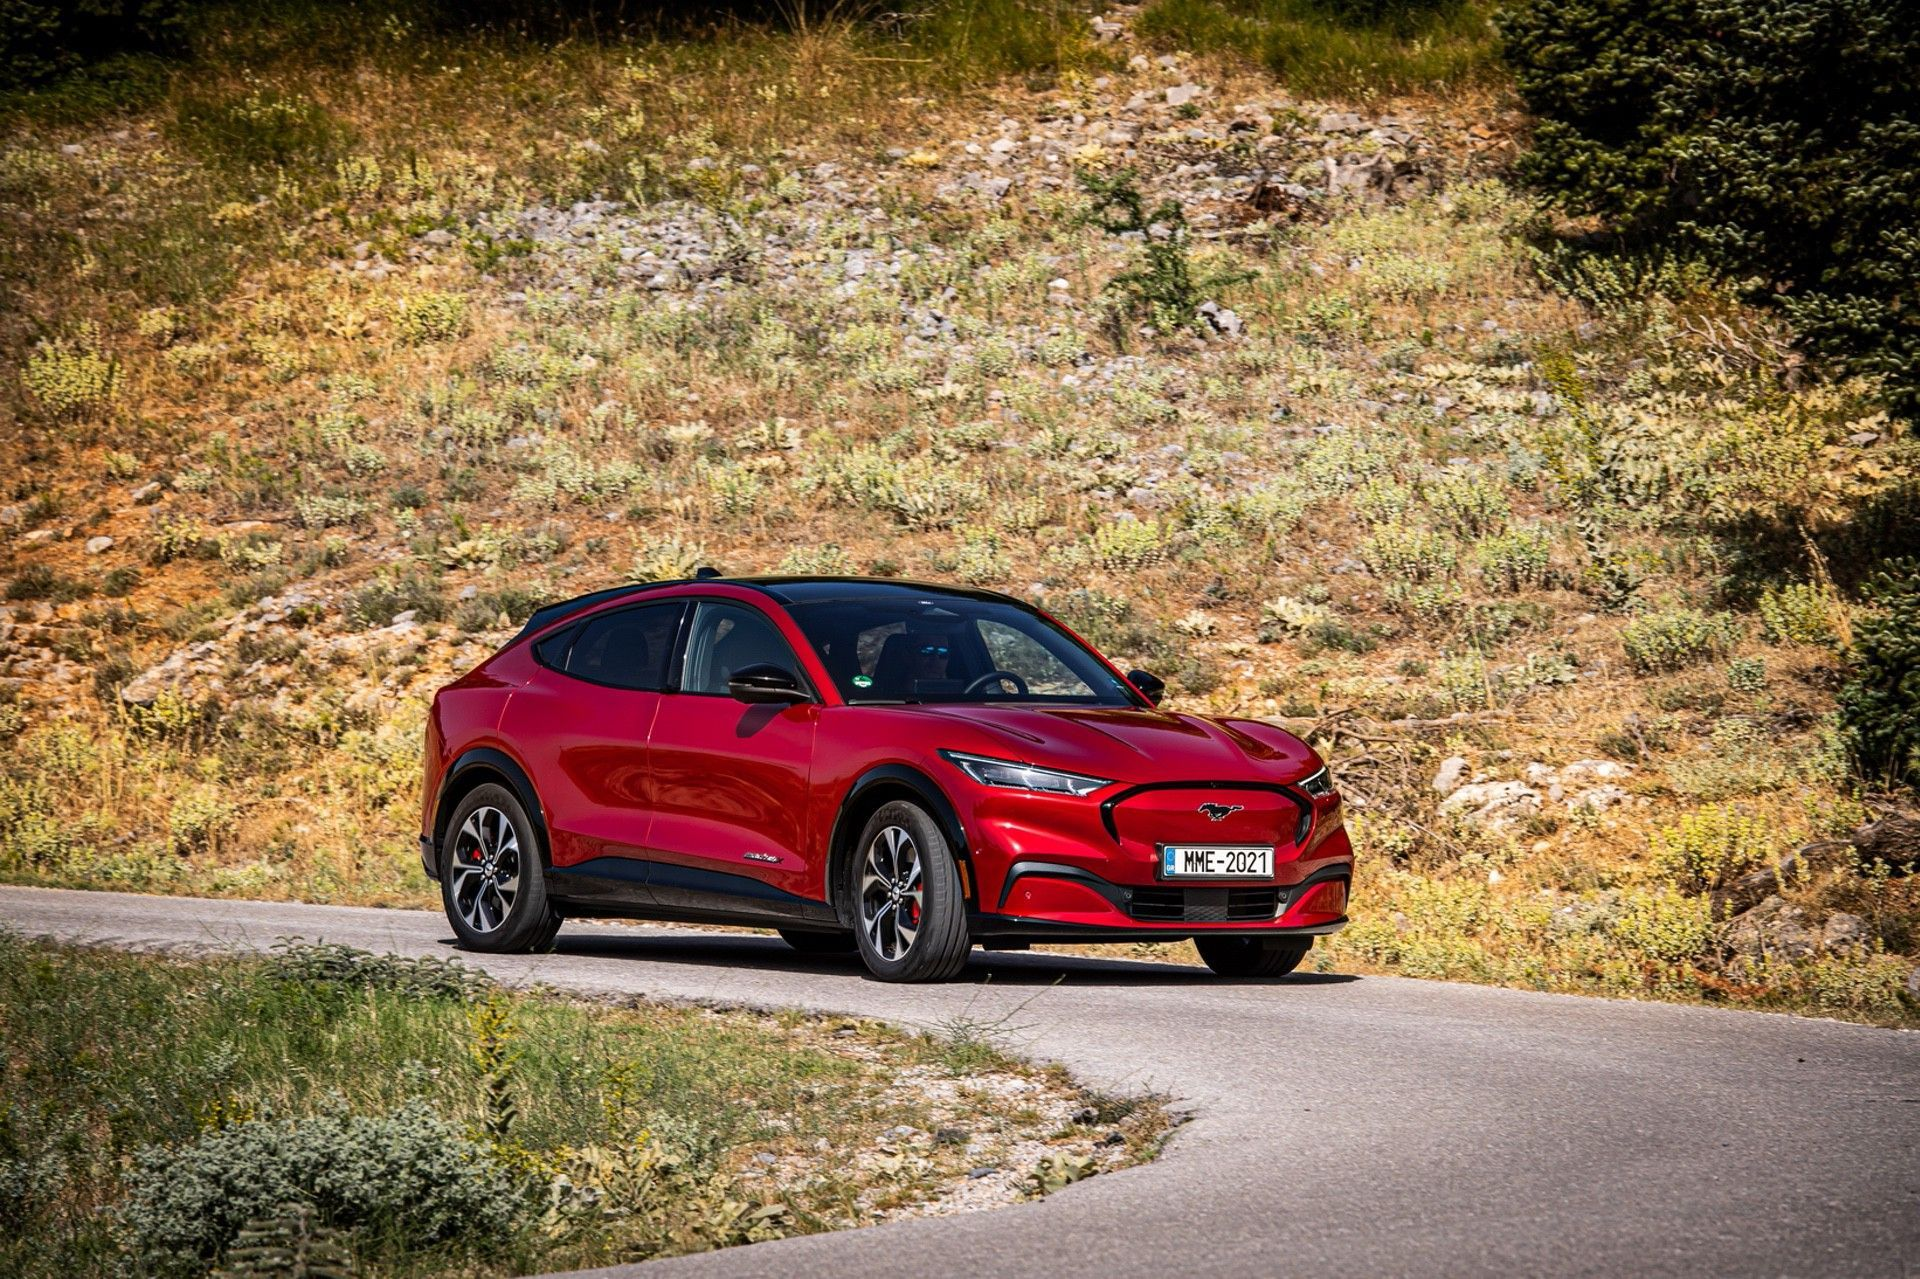 Ford_Mustang_Mach-E_greek_presskit-0110